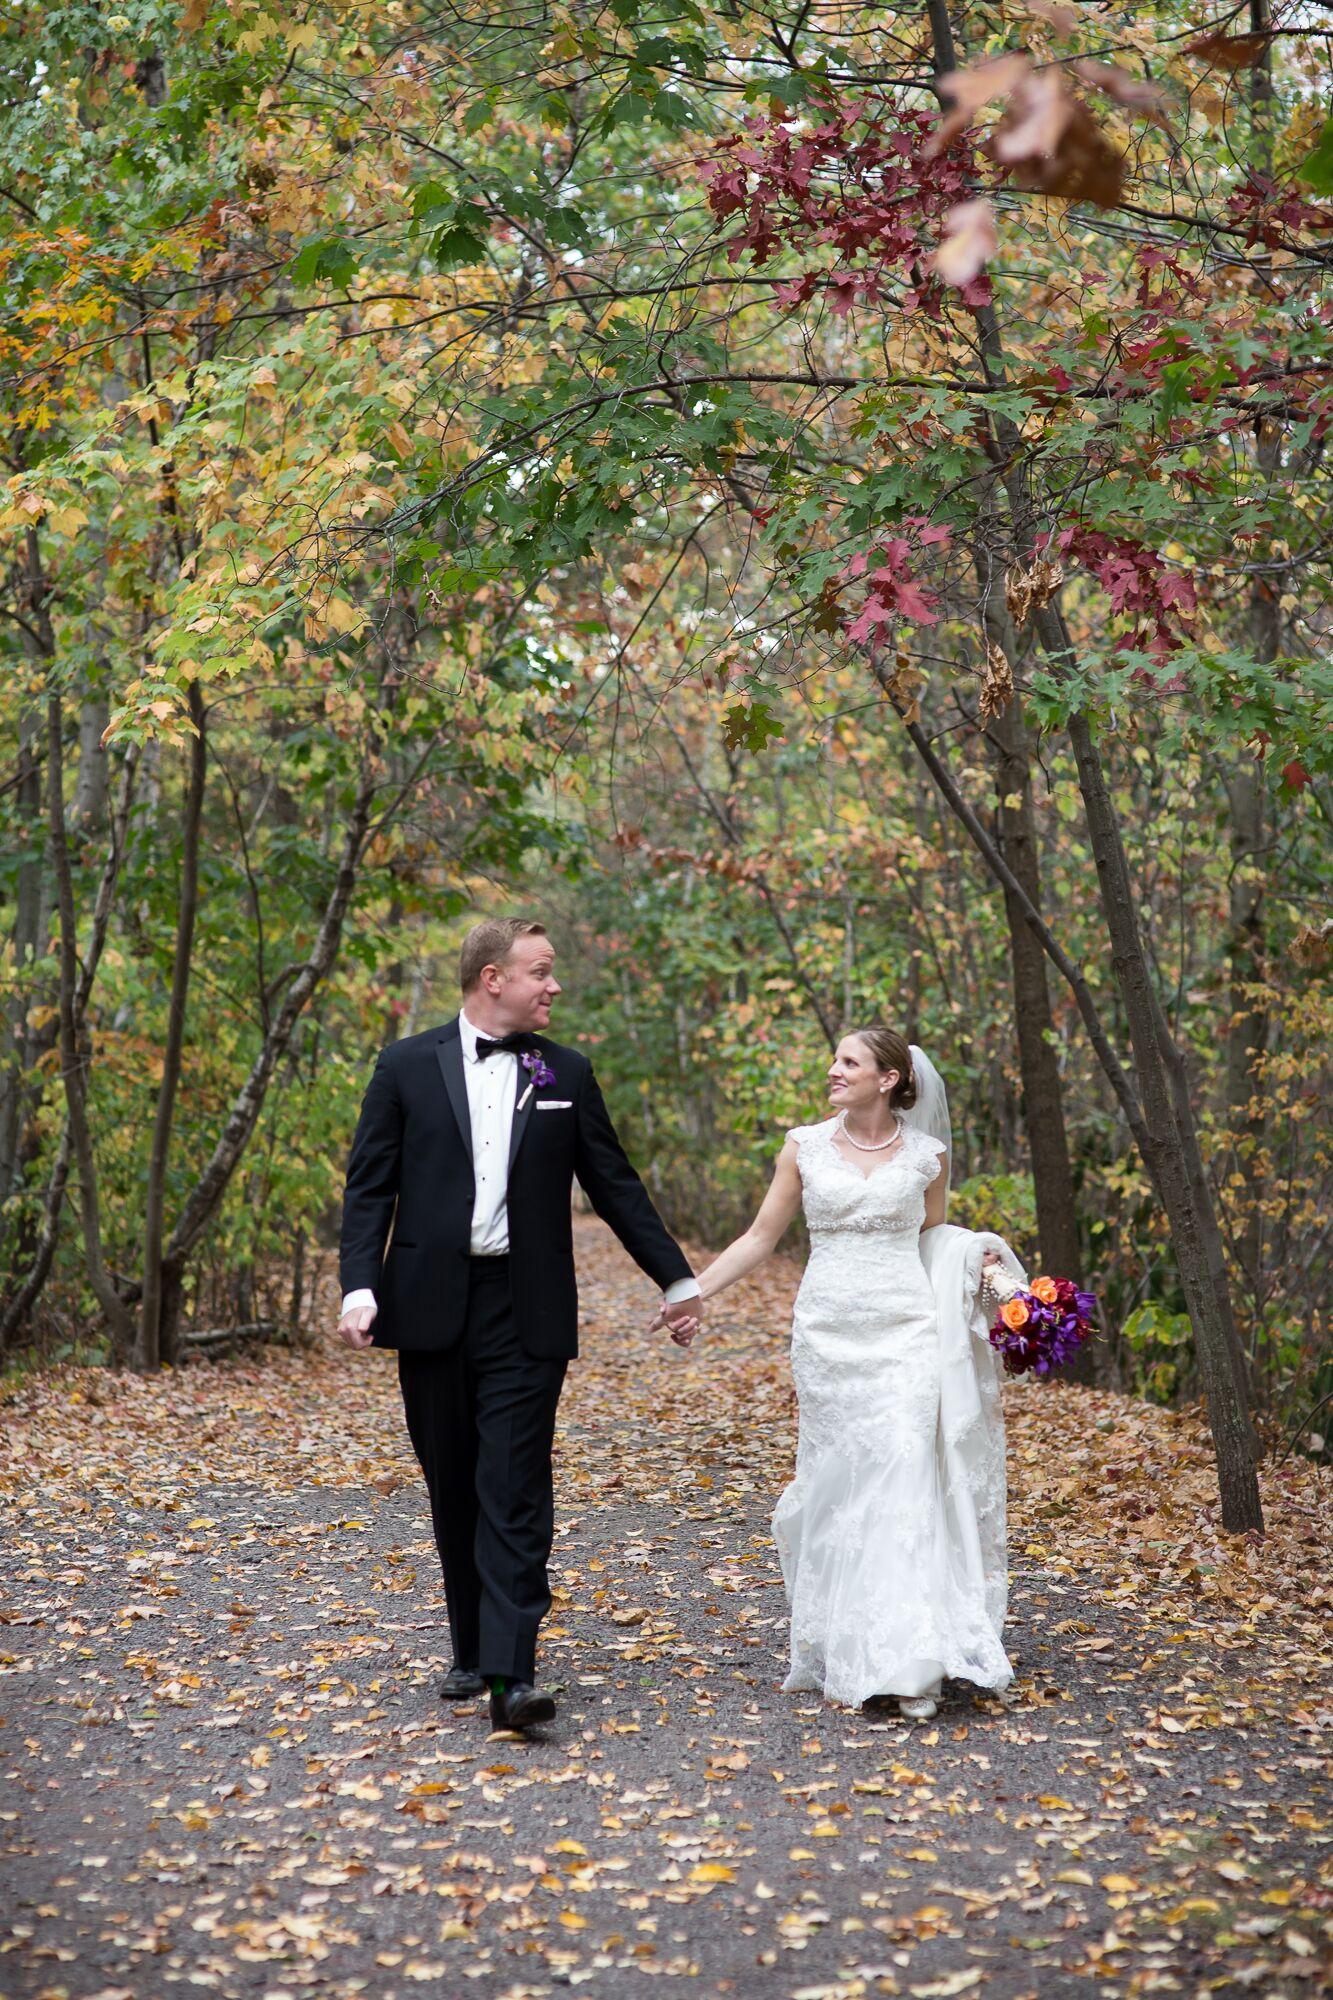 An Elegant Traditional Wedding At The Scranton Cultural